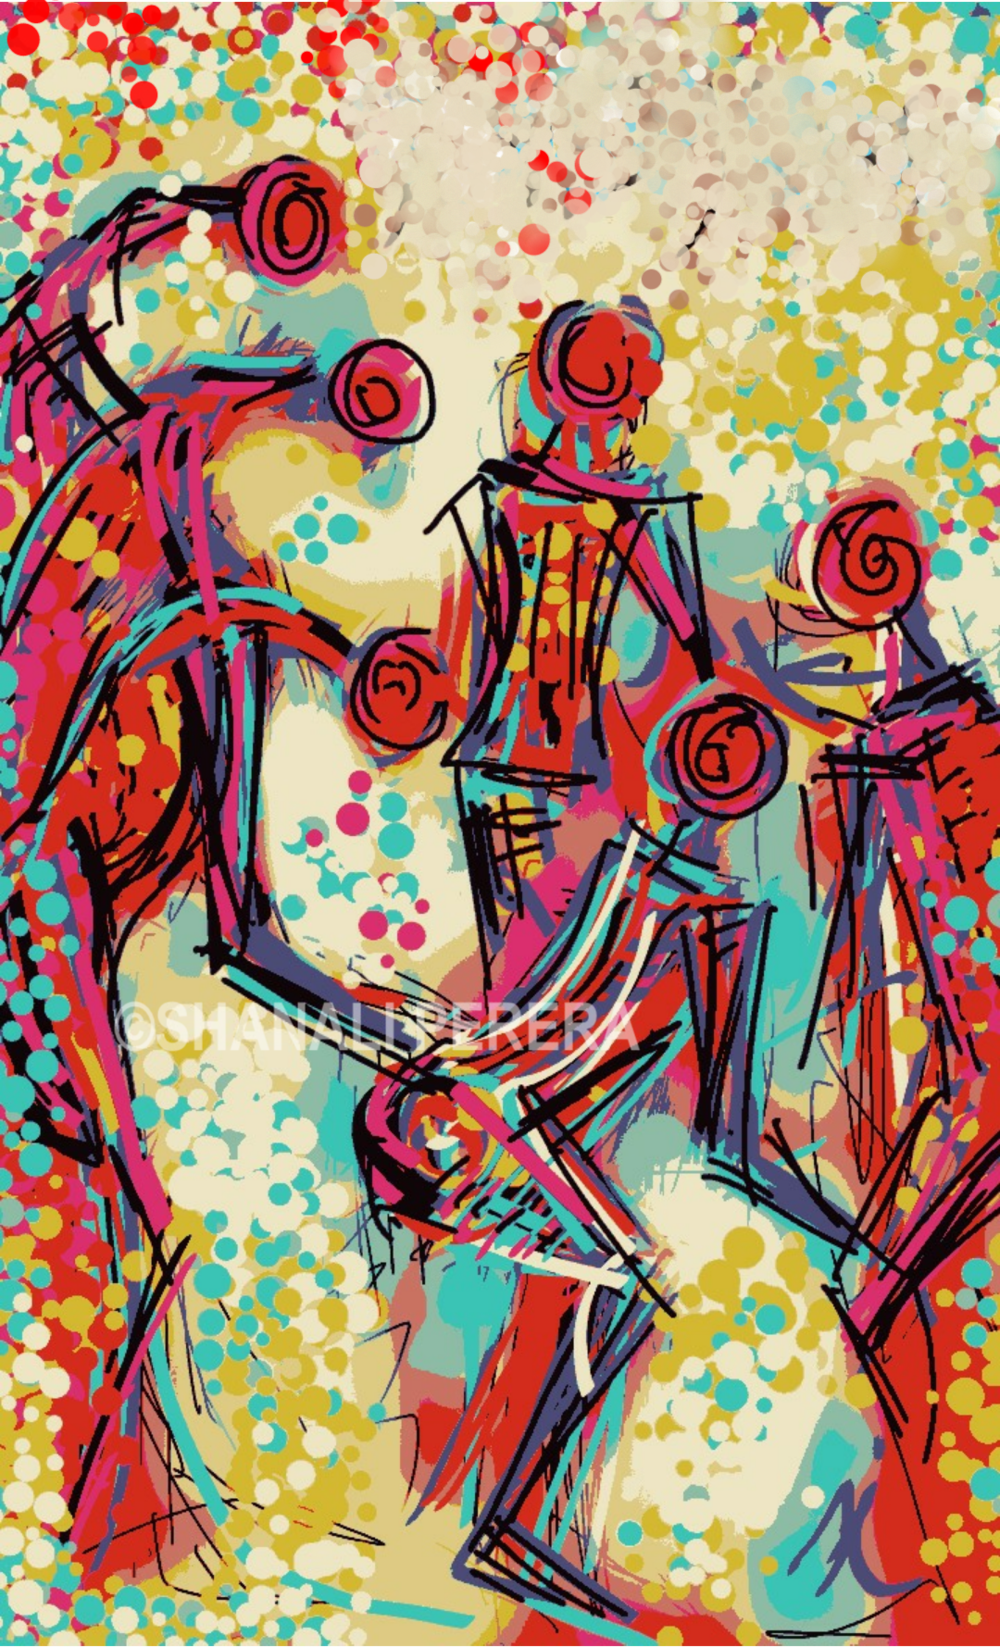 sketch-1514625298728.png